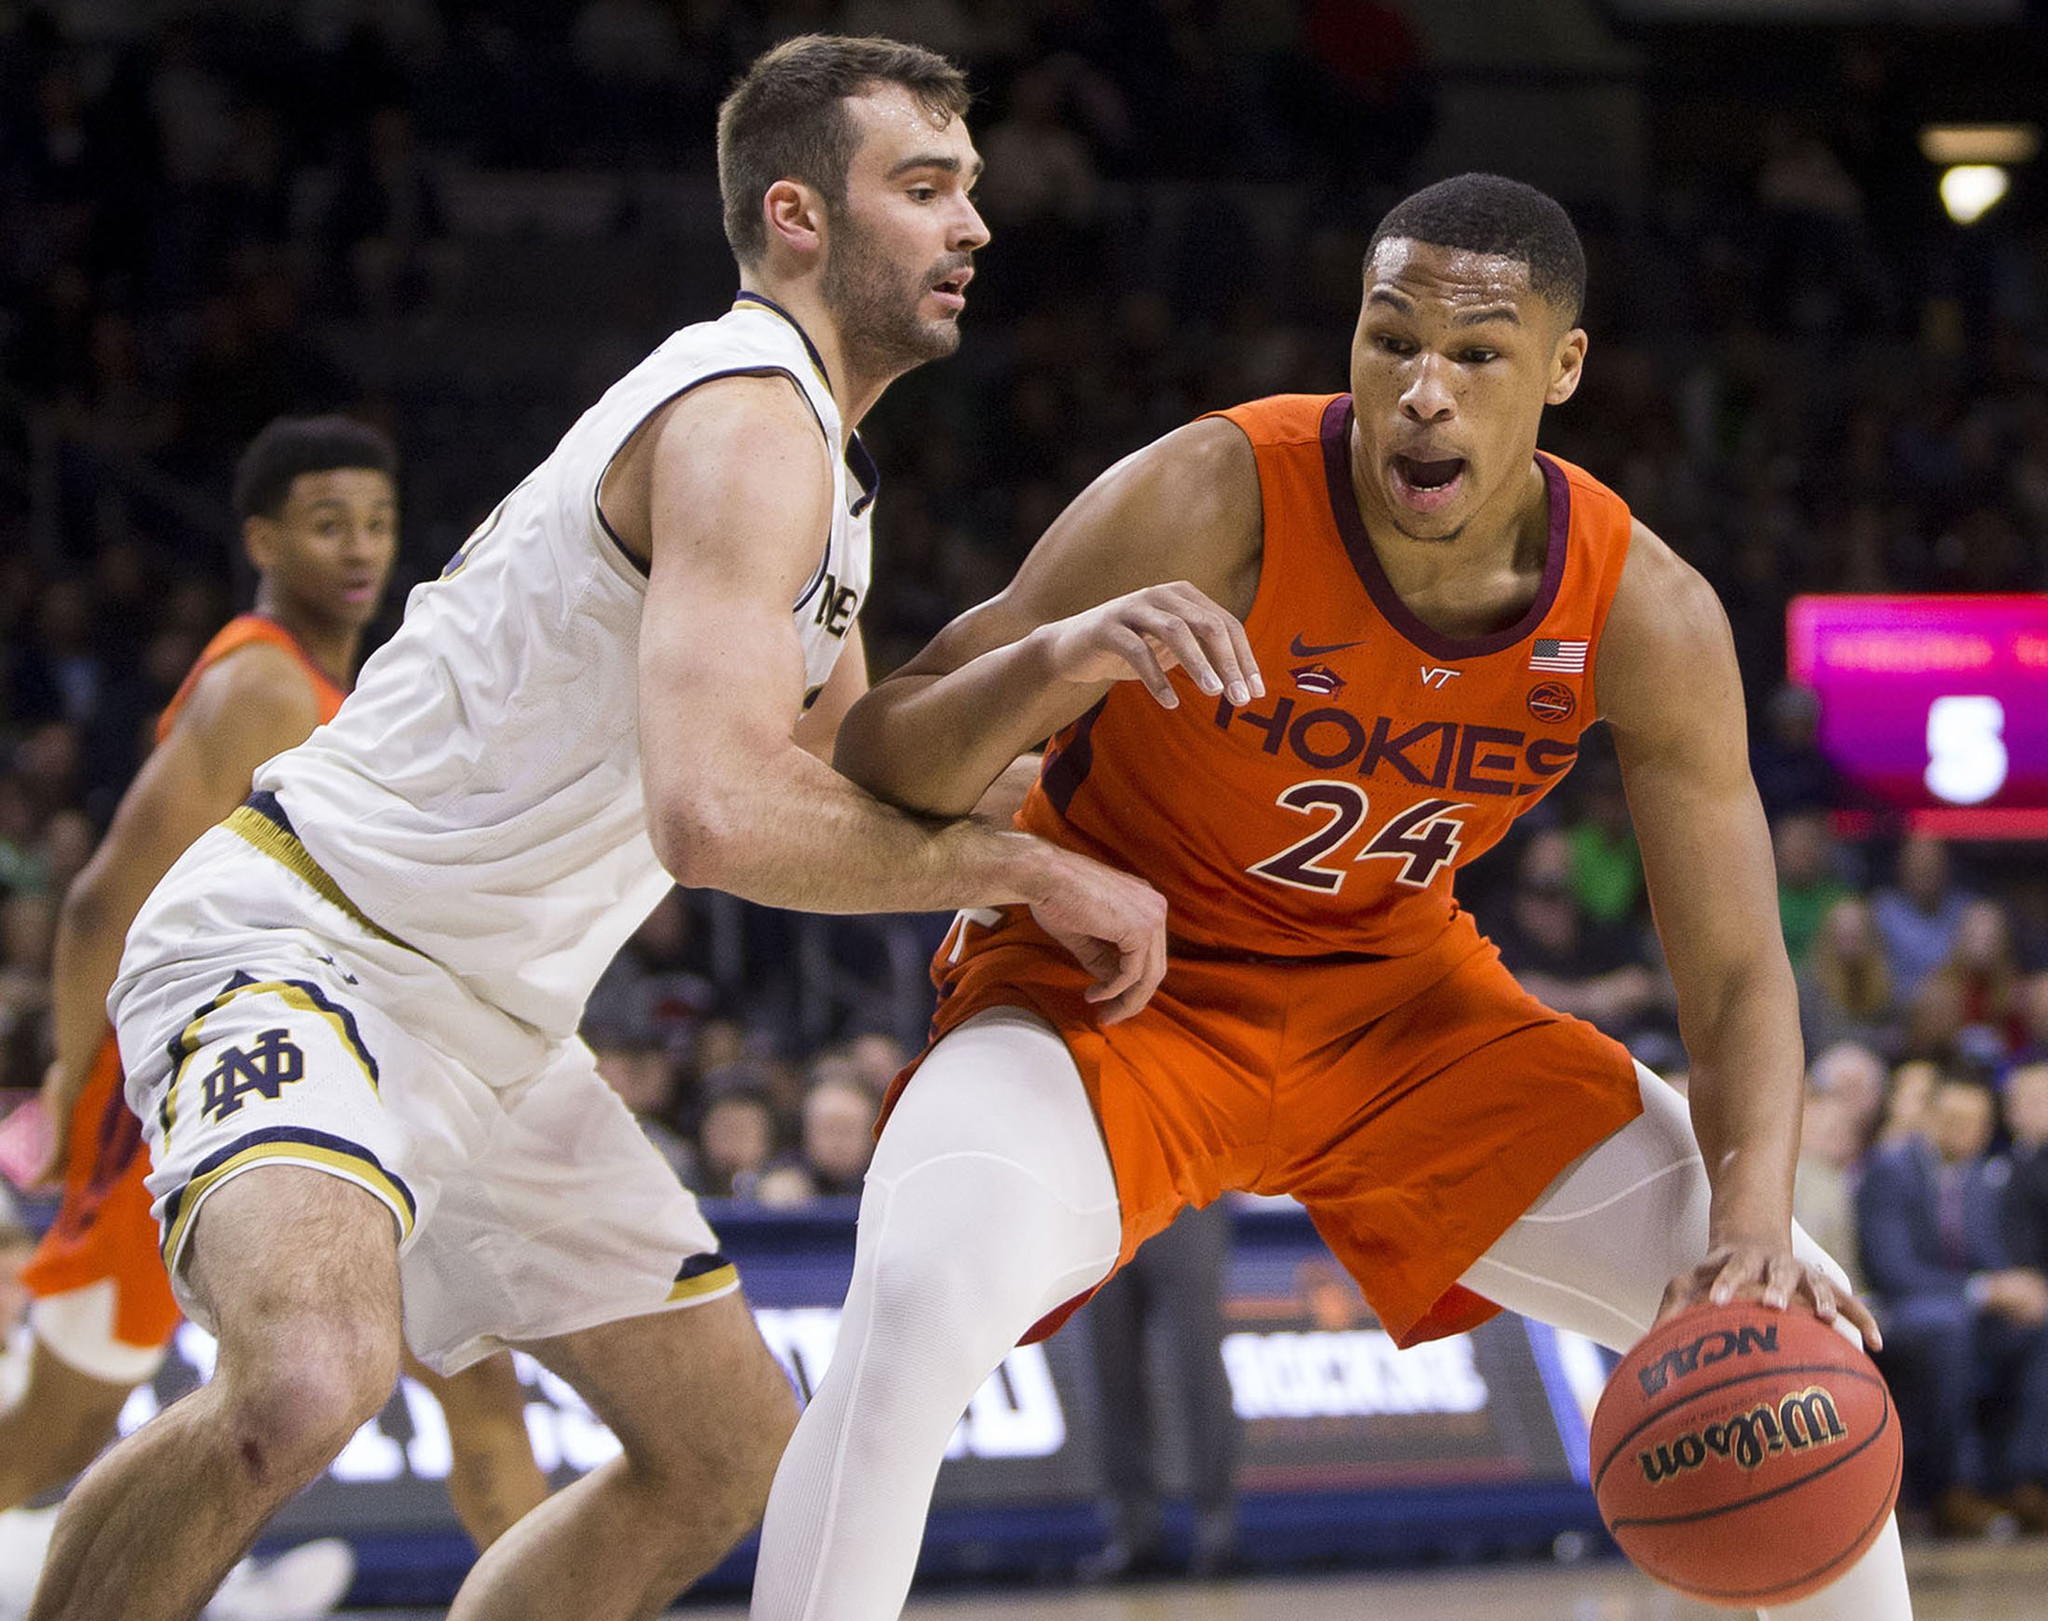 Kerry Blackshear Will Leave Virginia Tech Basketball Program For Florida The Virginian Pilot The Virginian Pilot